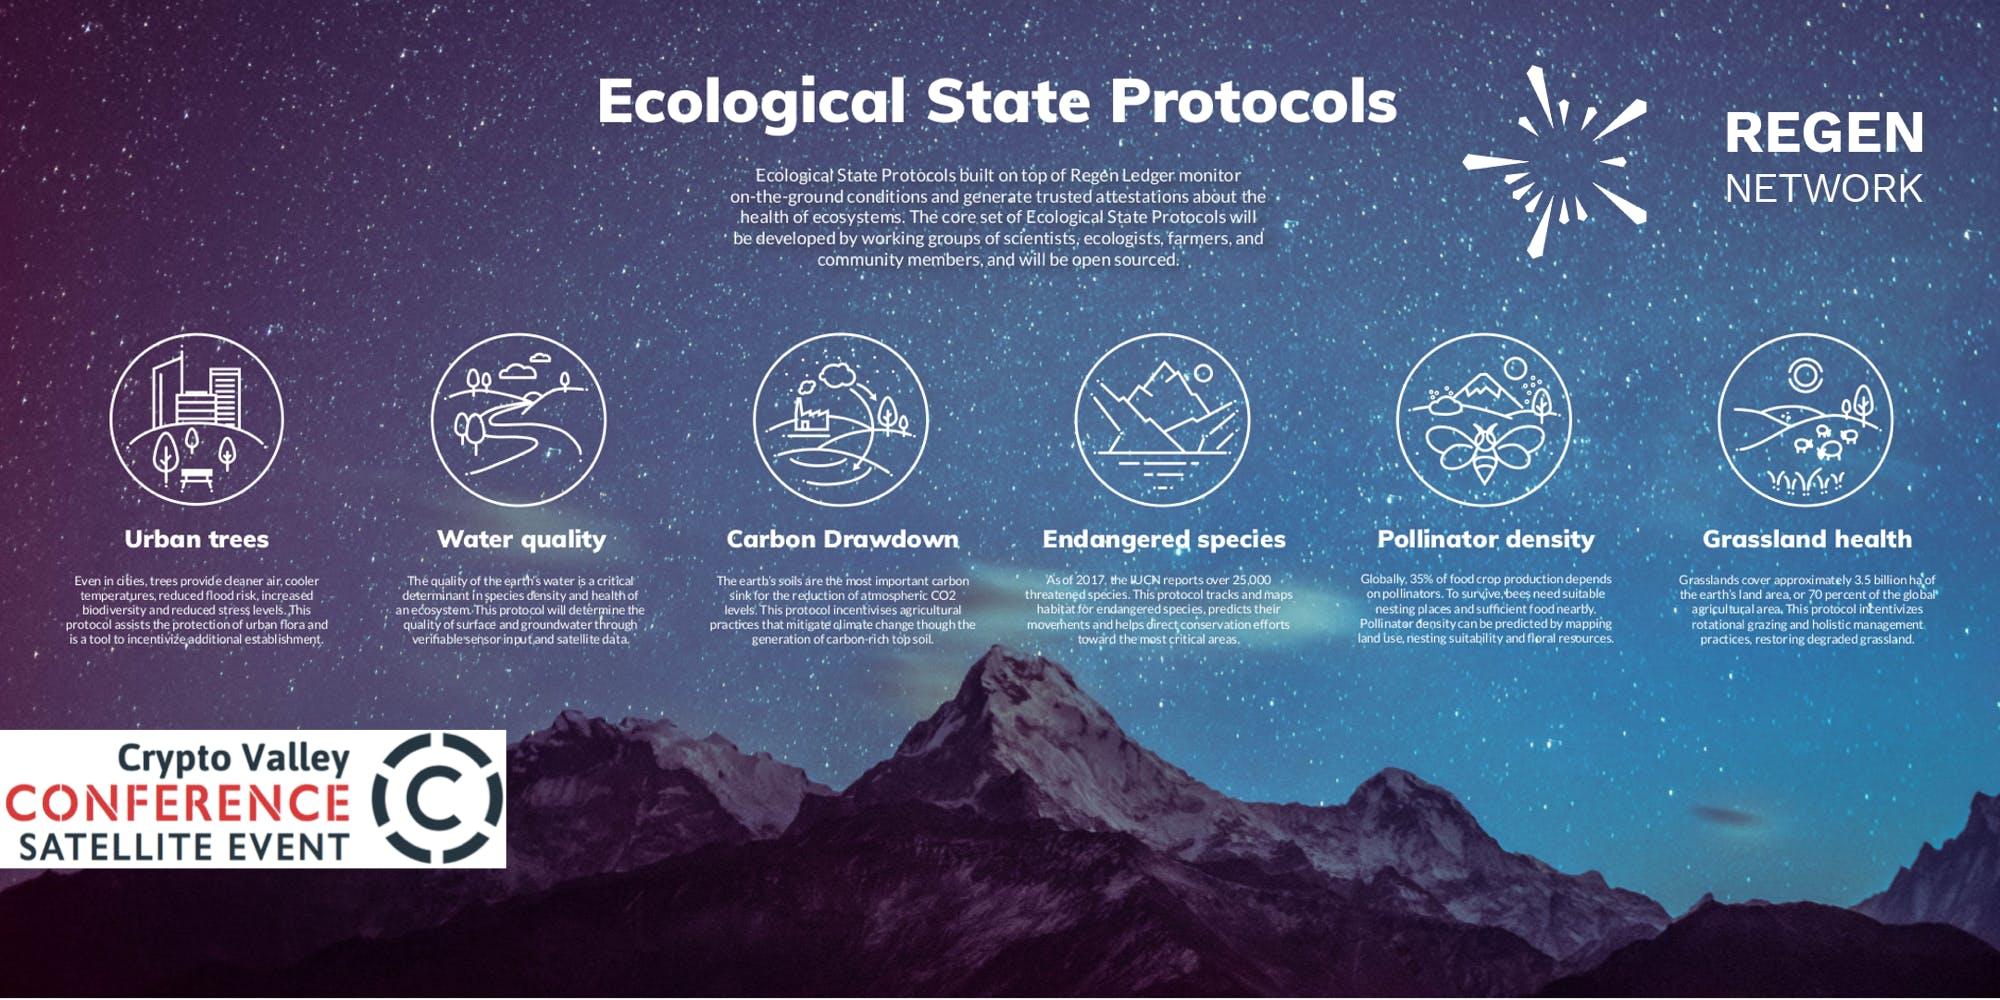 REGEN NETWORK PRESENTS:  Blockchain for the Planet